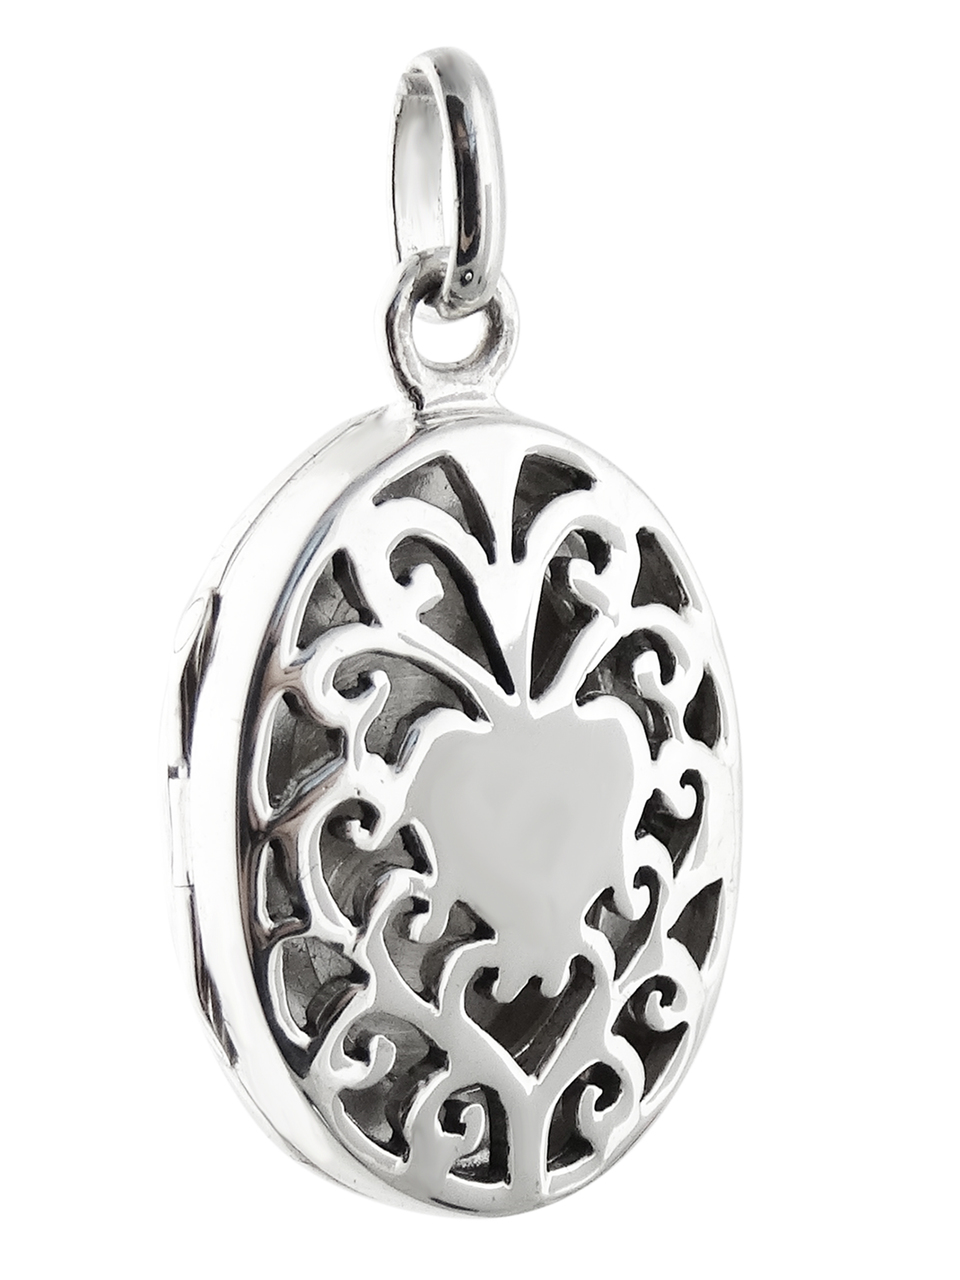 Oval Filigree Heart Locket - 925 Sterling Silver